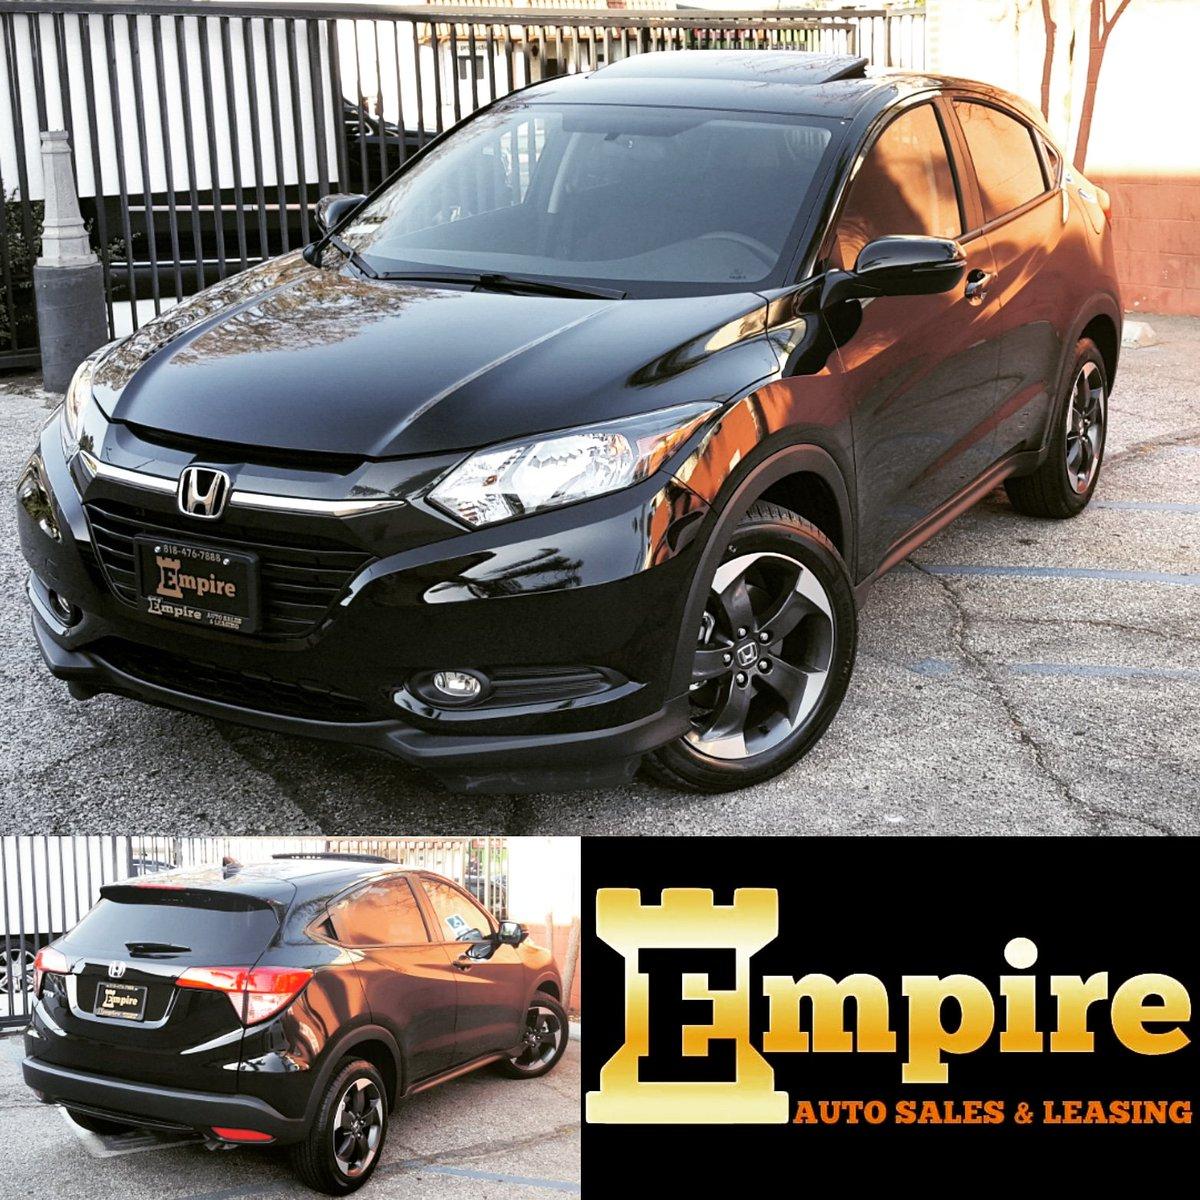 empireauto new car lease purchase finance newcarlease newcarfinance autobroker autobrokers autobrokersales brokerdeals broker special